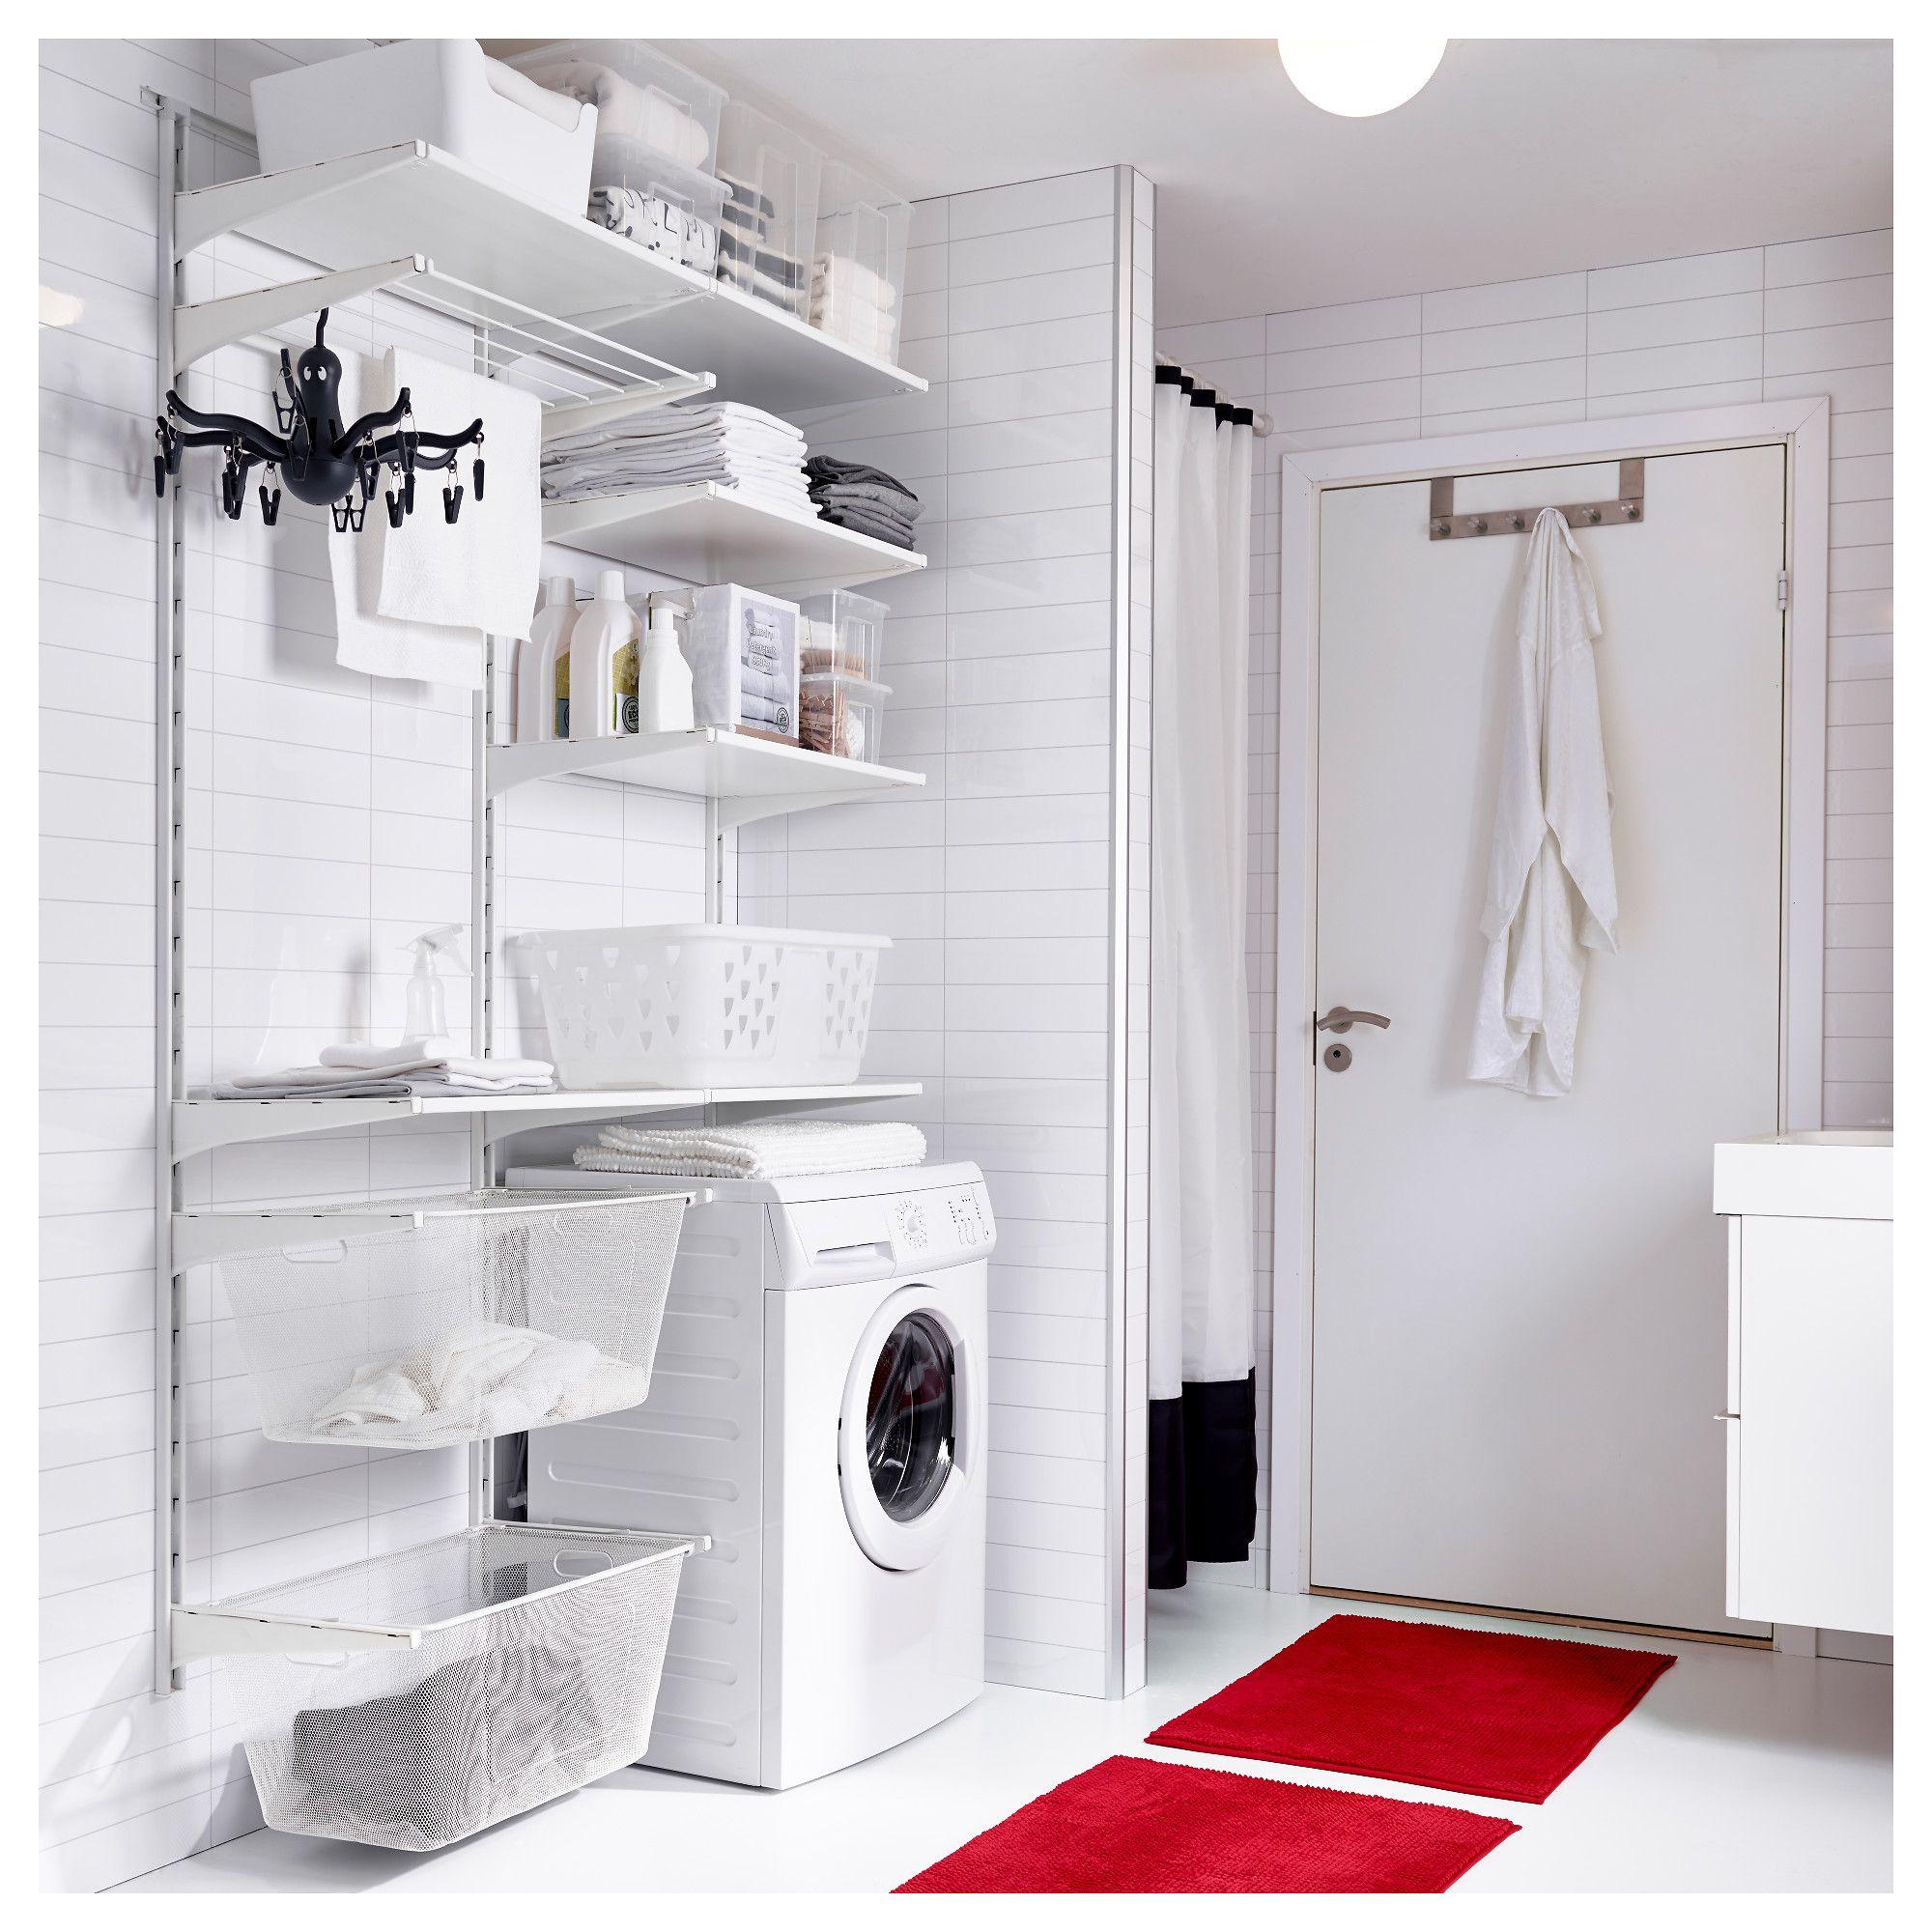 Ikea Australia Affordable Swedish Home Furniture Ikea Laundry Room Laundry Design Ikea Laundry